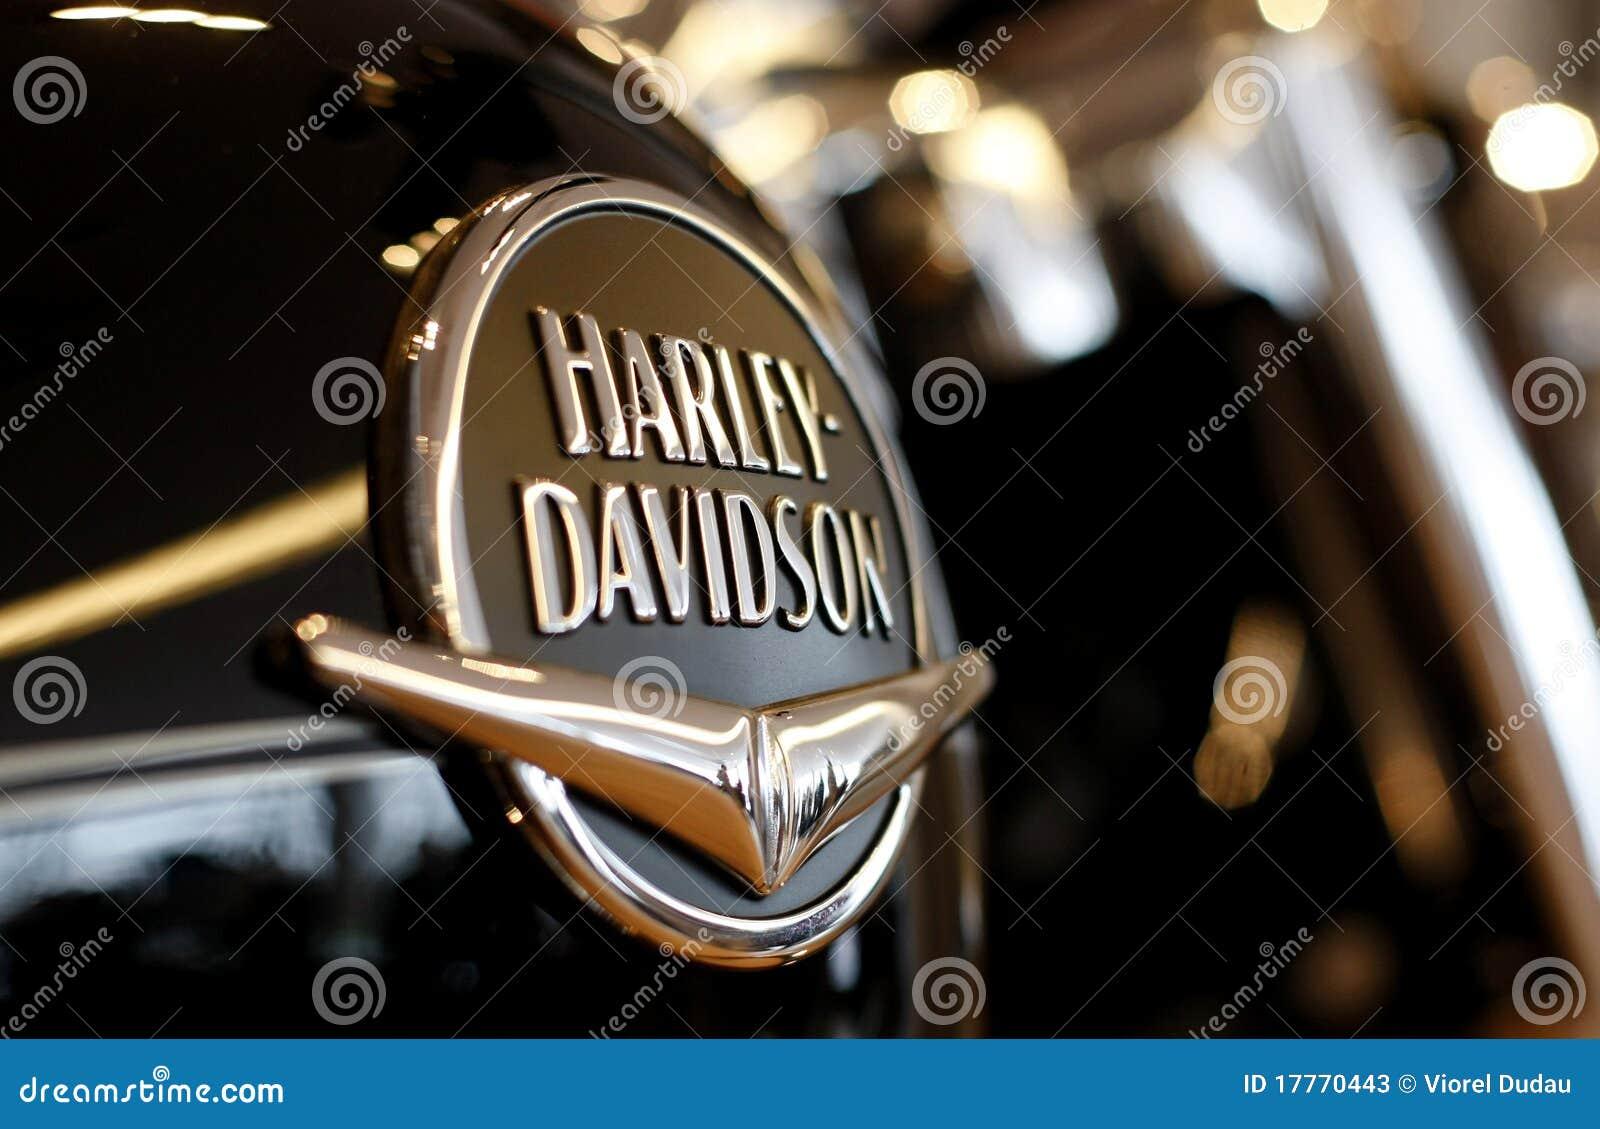 Davidson harley logo